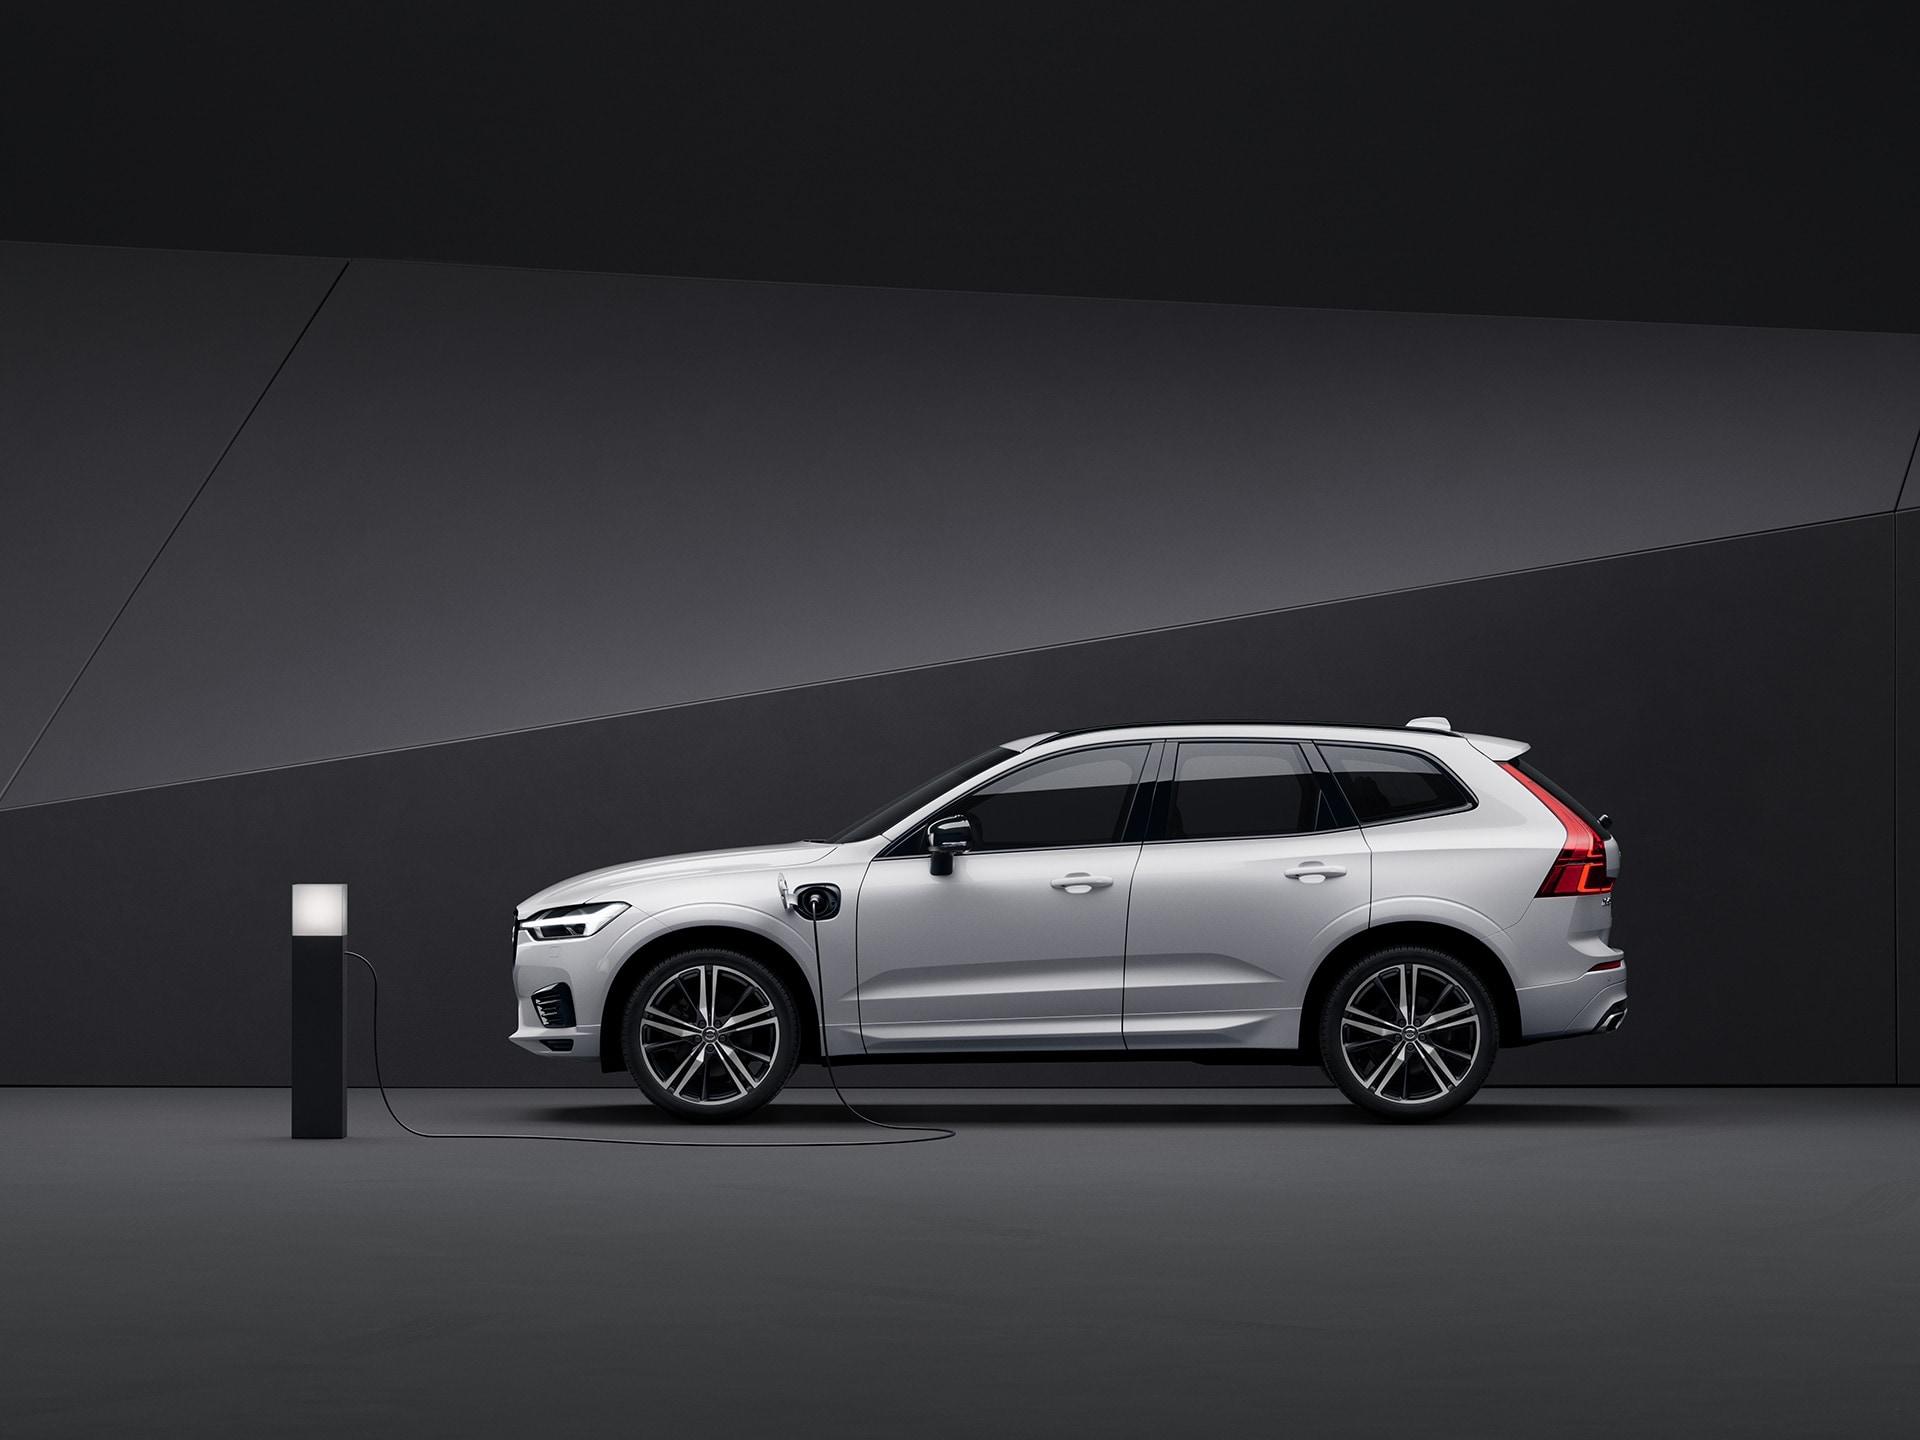 Volvo XC60 Recharge สีขาวกำลังชาร์จไฟท่ามกลางฉากสีดำ